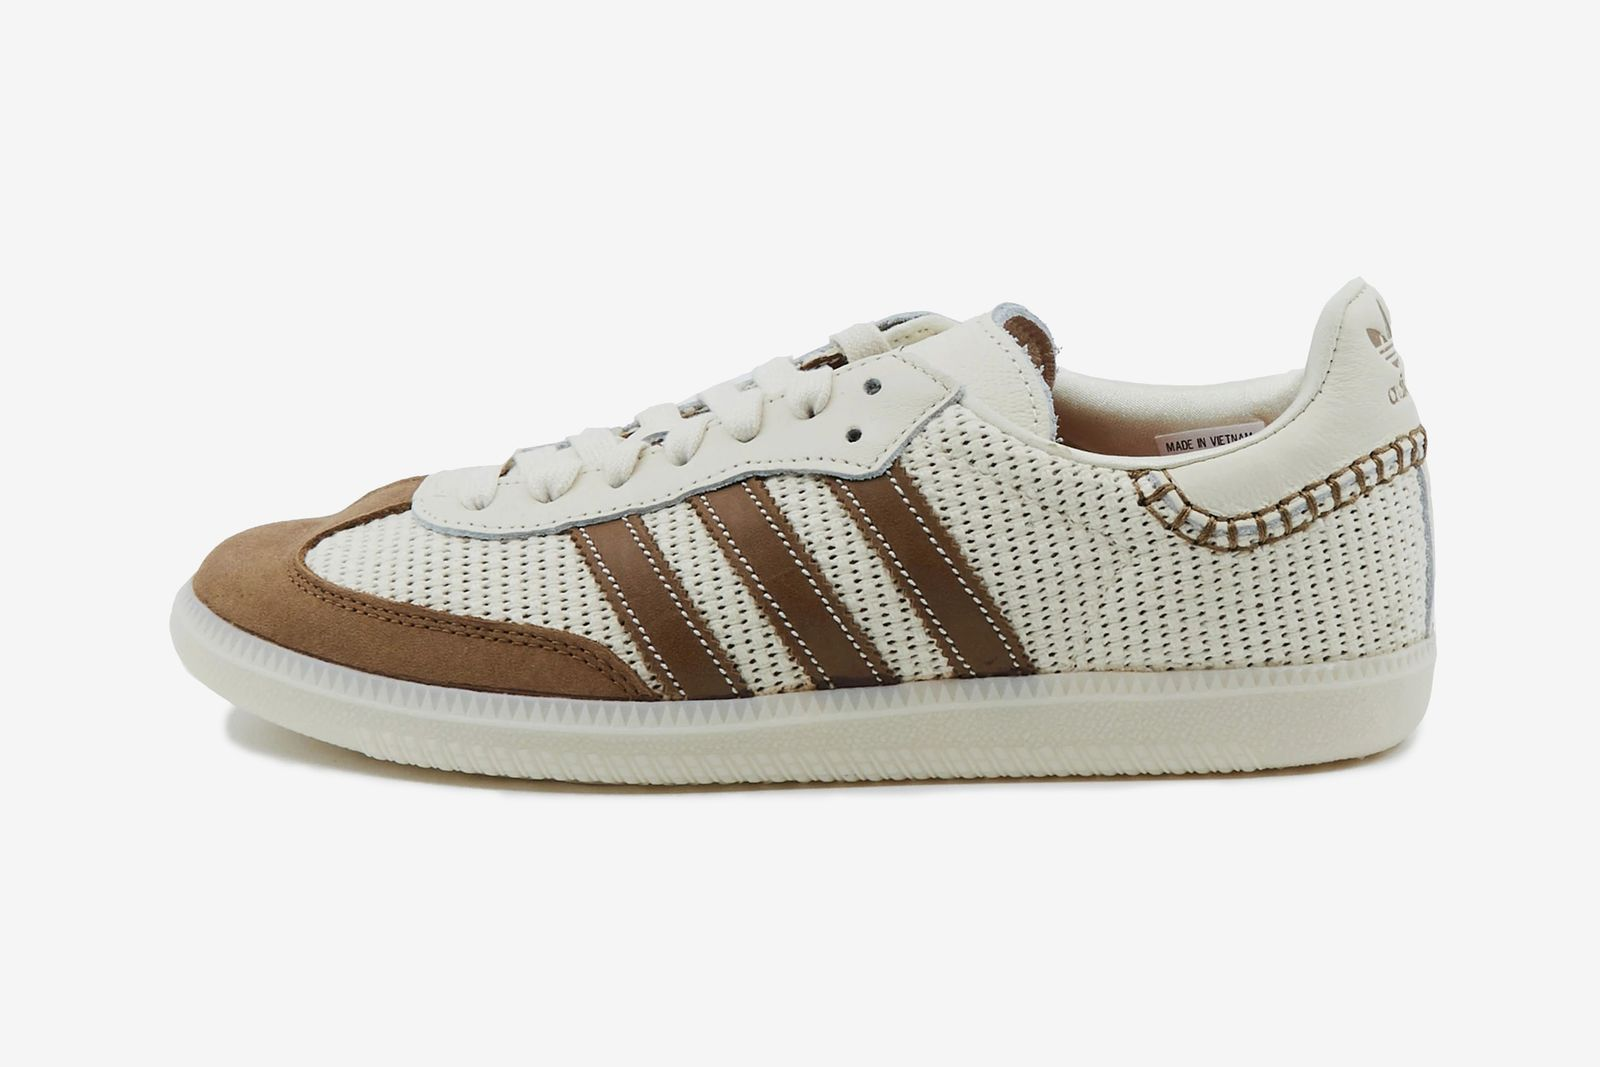 wales-bonner-adidas-originals-samba-release-date-price-06